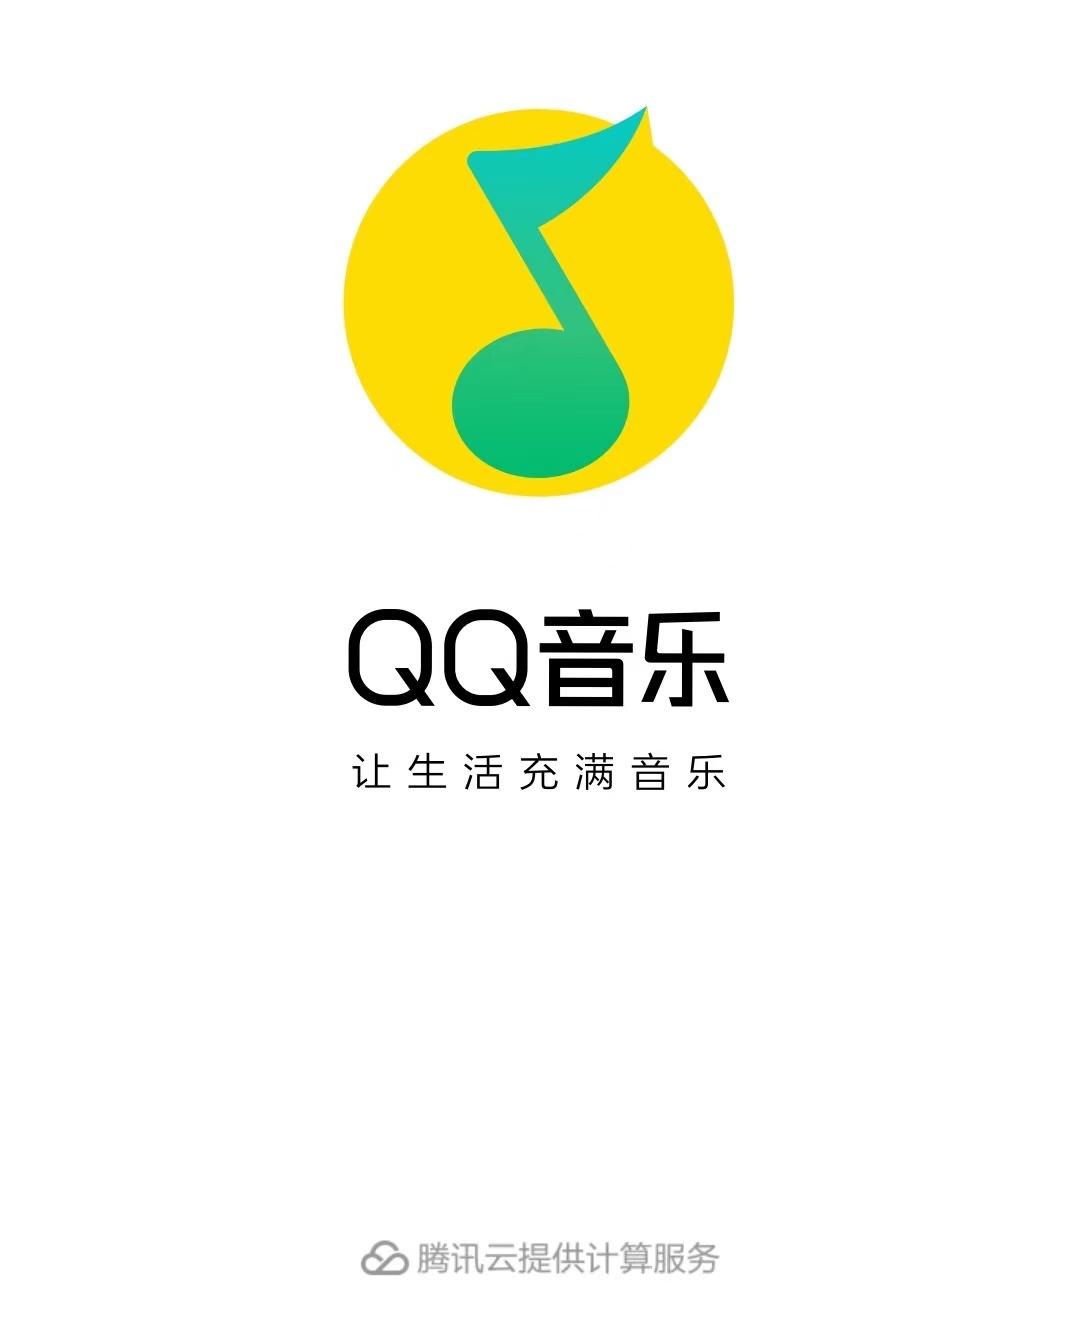 QQ音乐简洁版上线 再掀极简听歌风潮